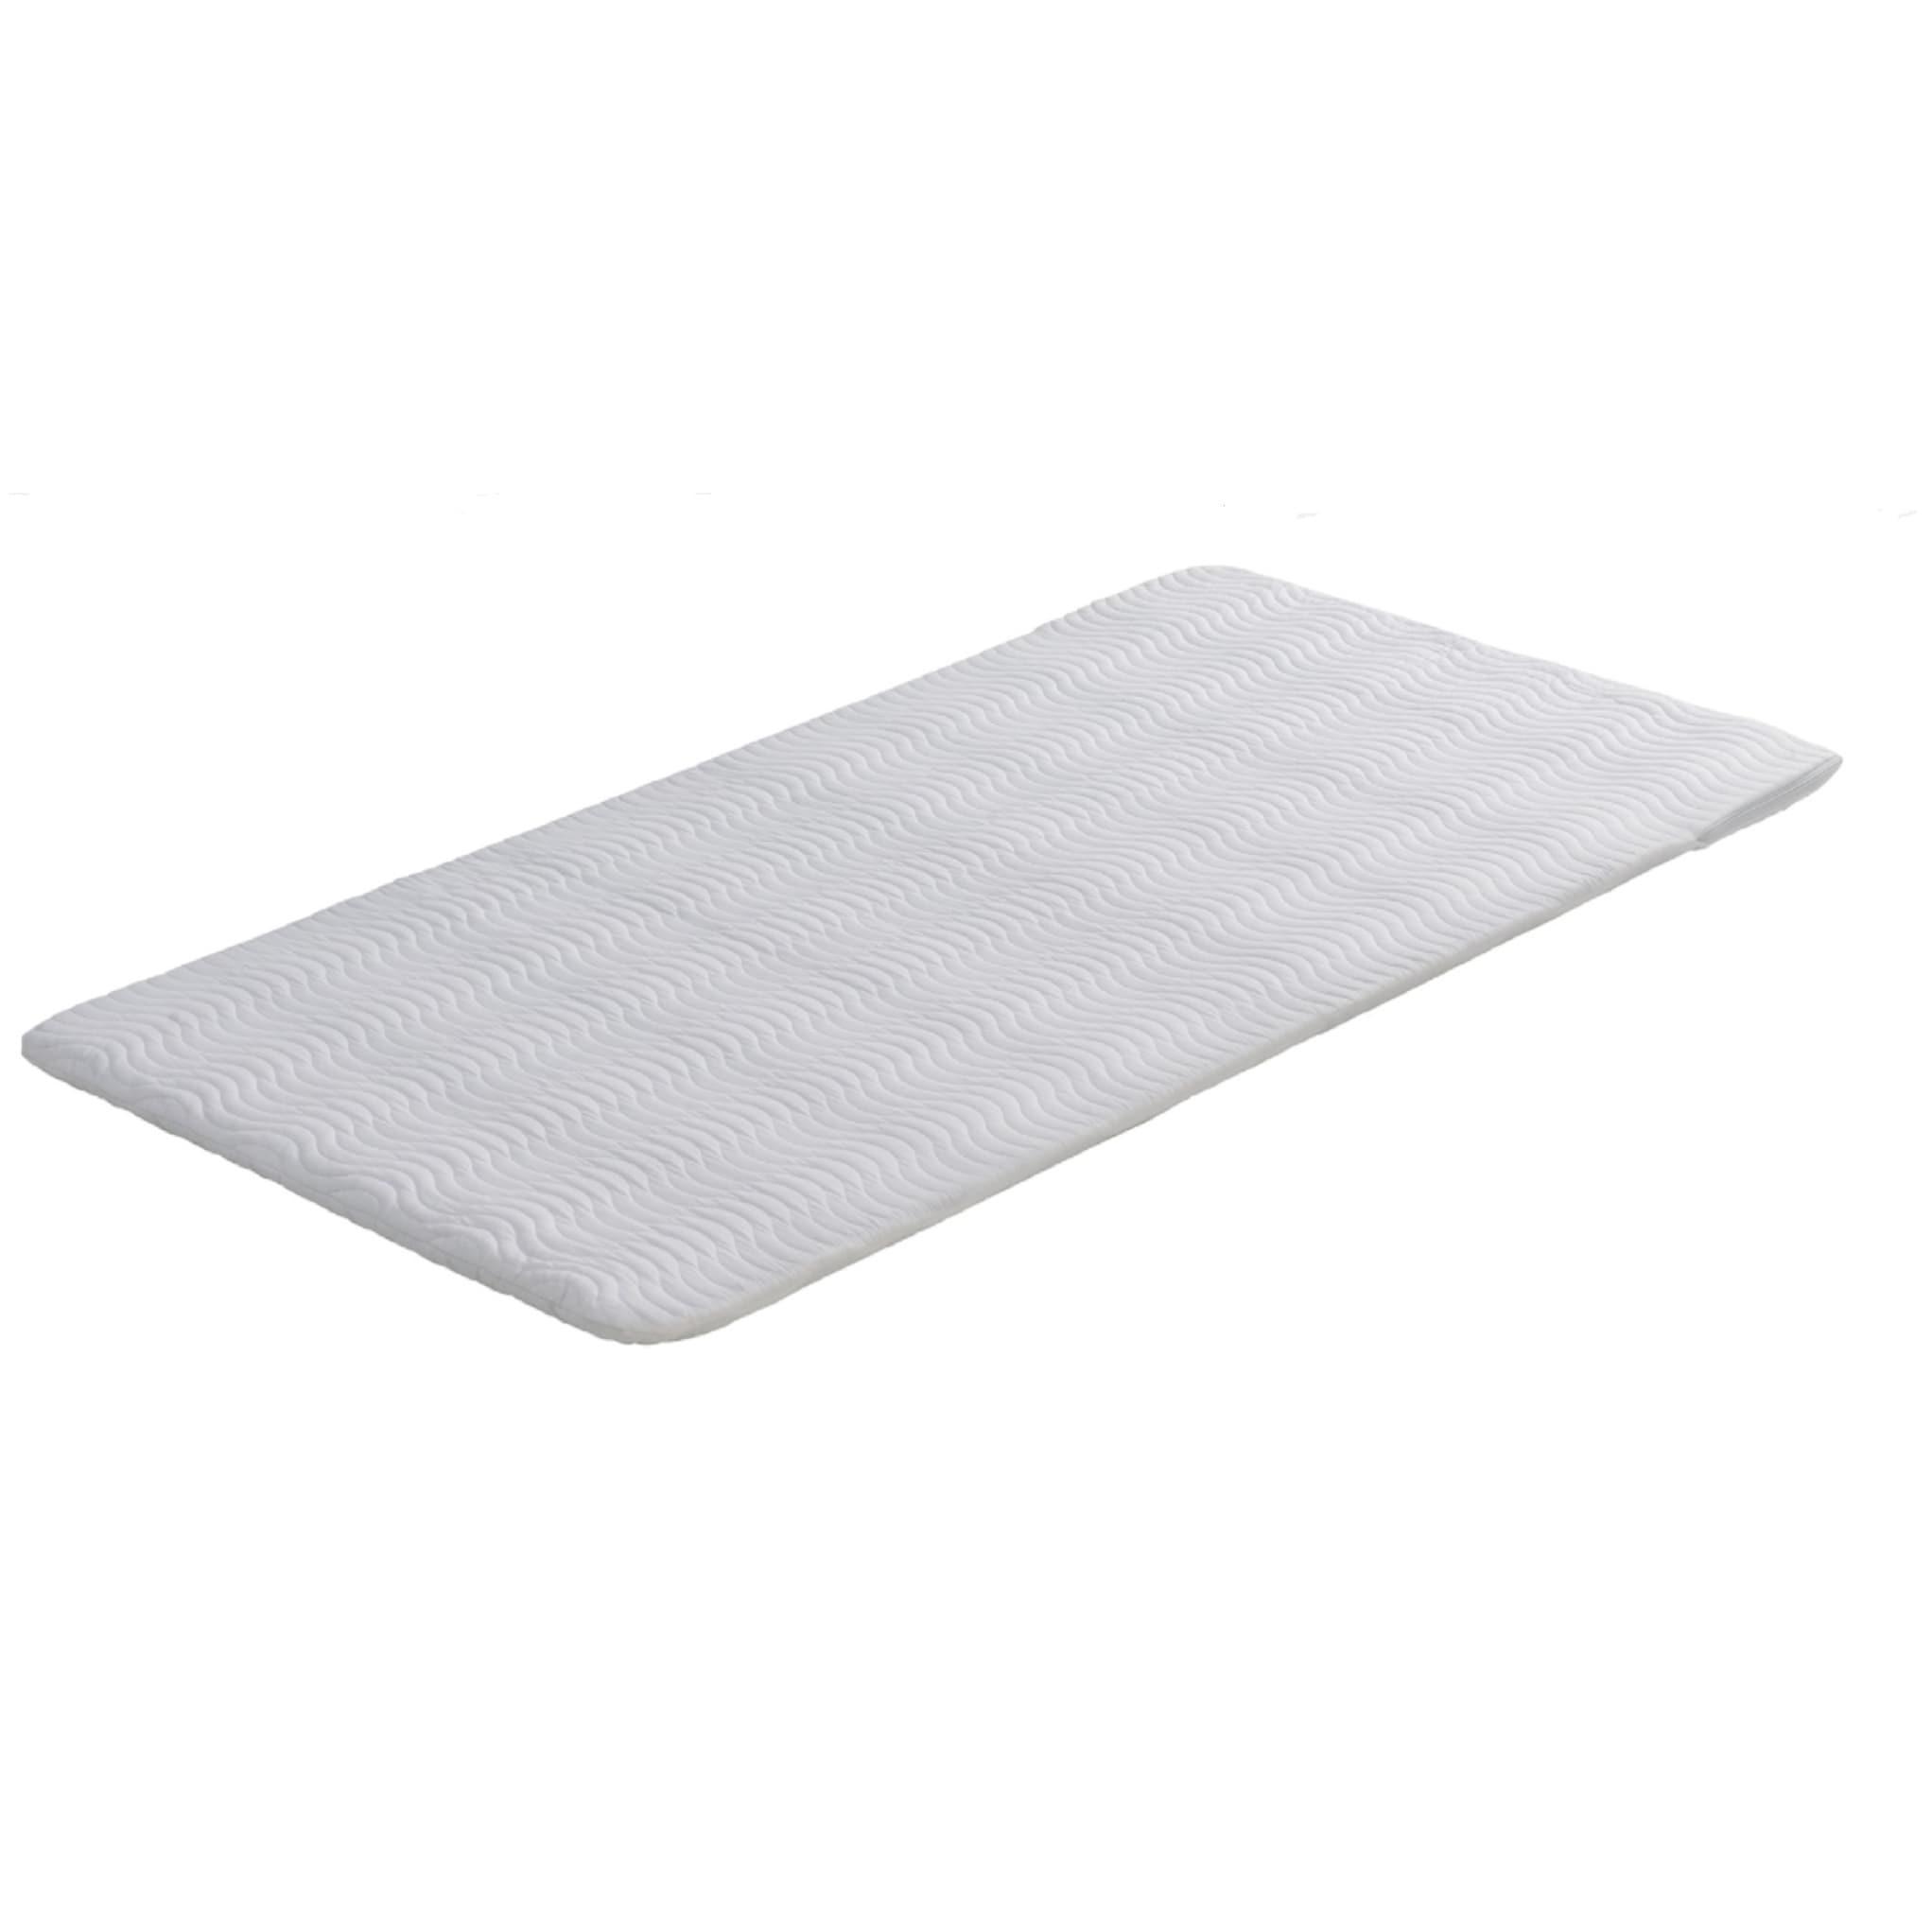 DHP Signature Sleep Ultra Steel Bunkie Board (Bunkie boar...